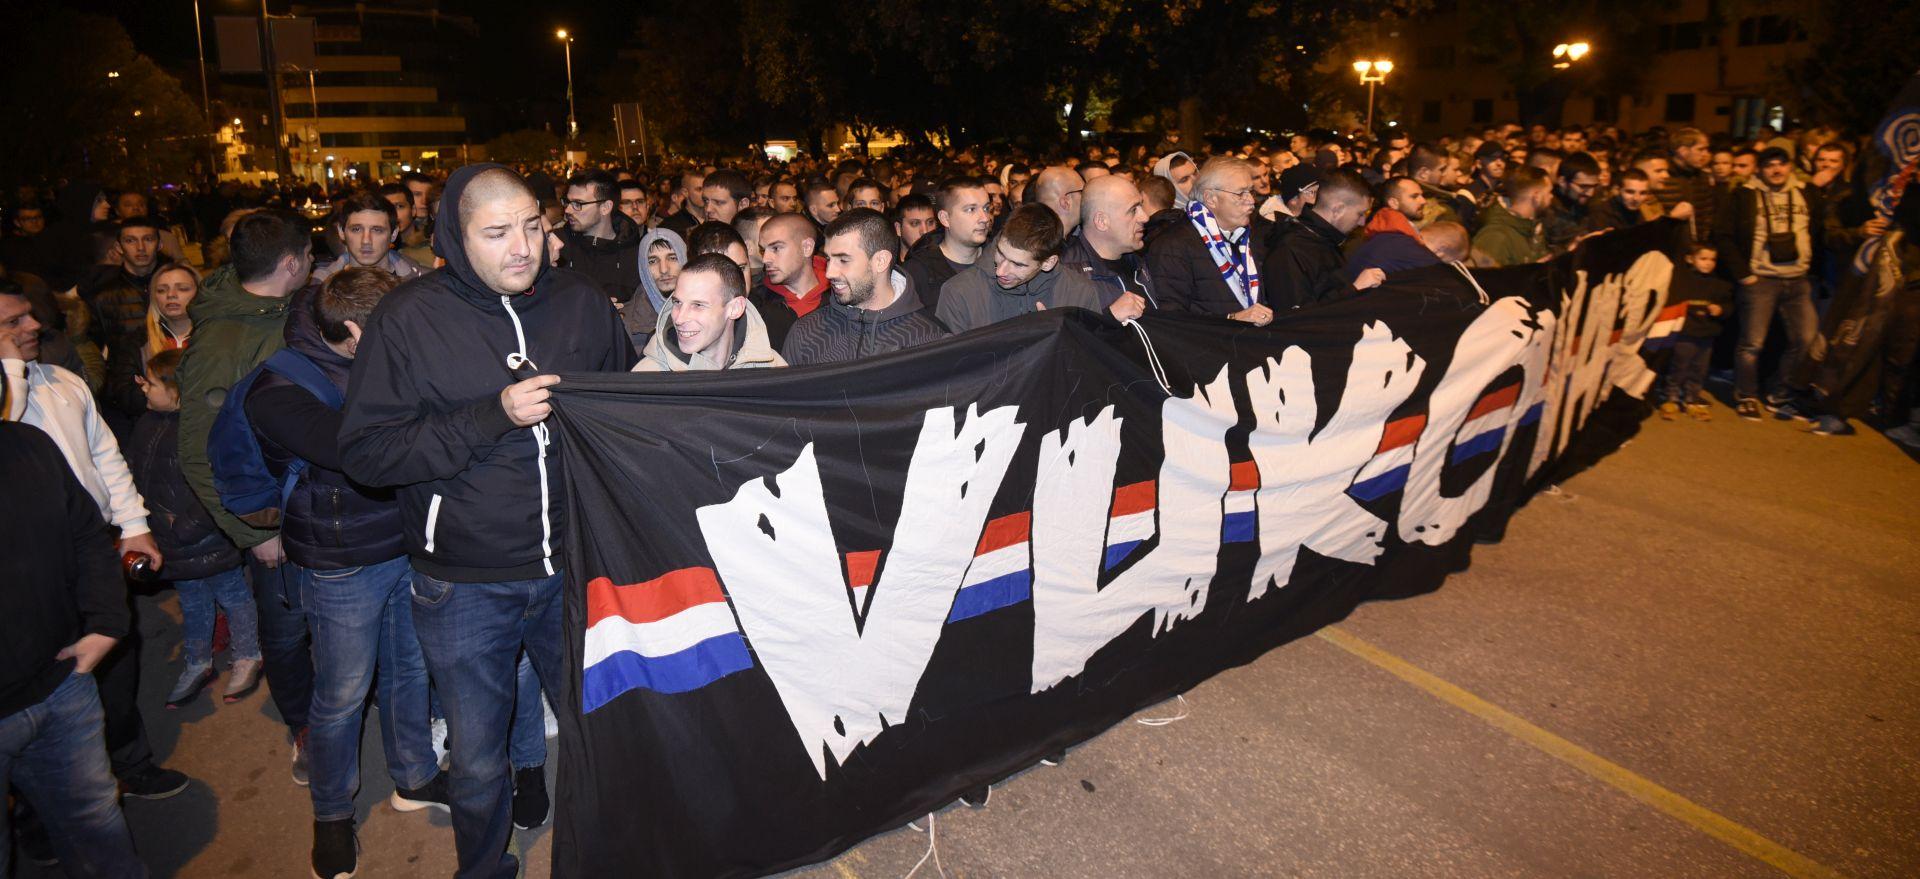 Torcida mimohodom odala počast Vukovaru i Škabrnji